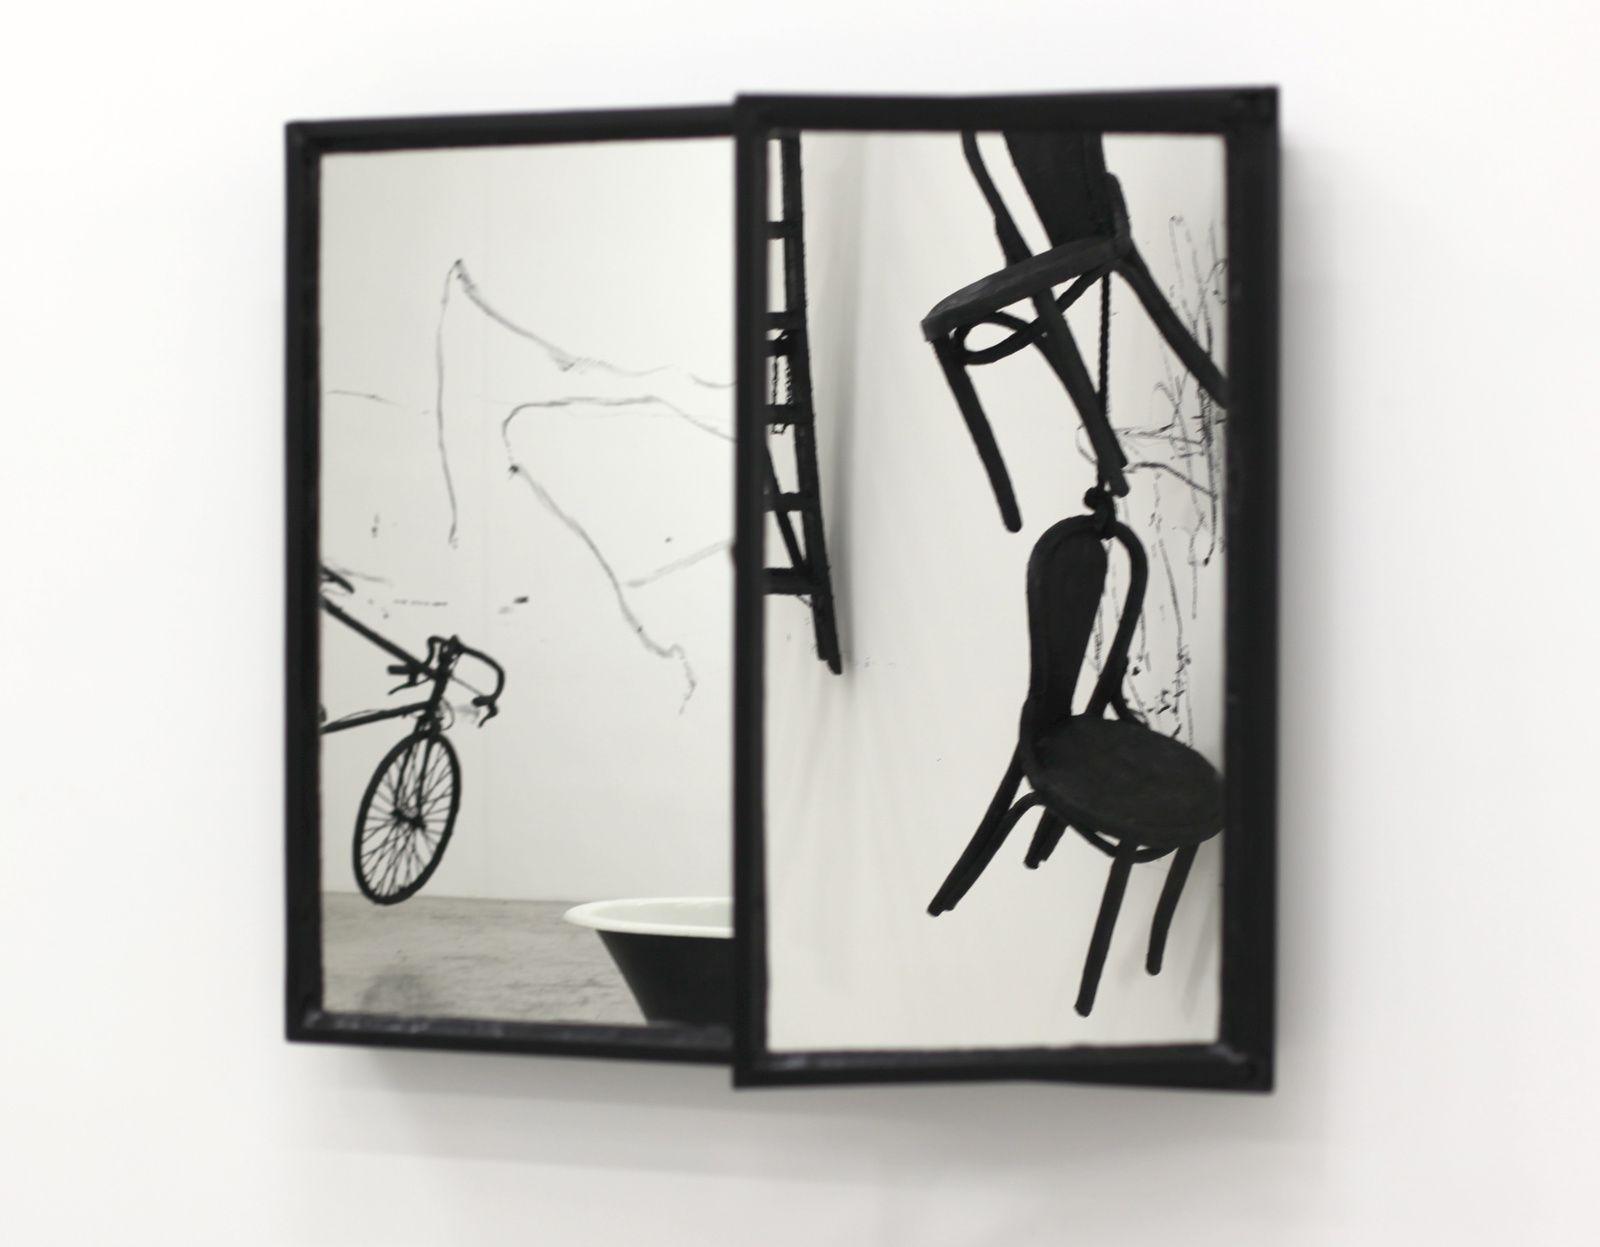 """Two Windows"", 2017 de Robin RHODE - Courtesy Galerie Kamel Mennour © Photo Éric Simon"